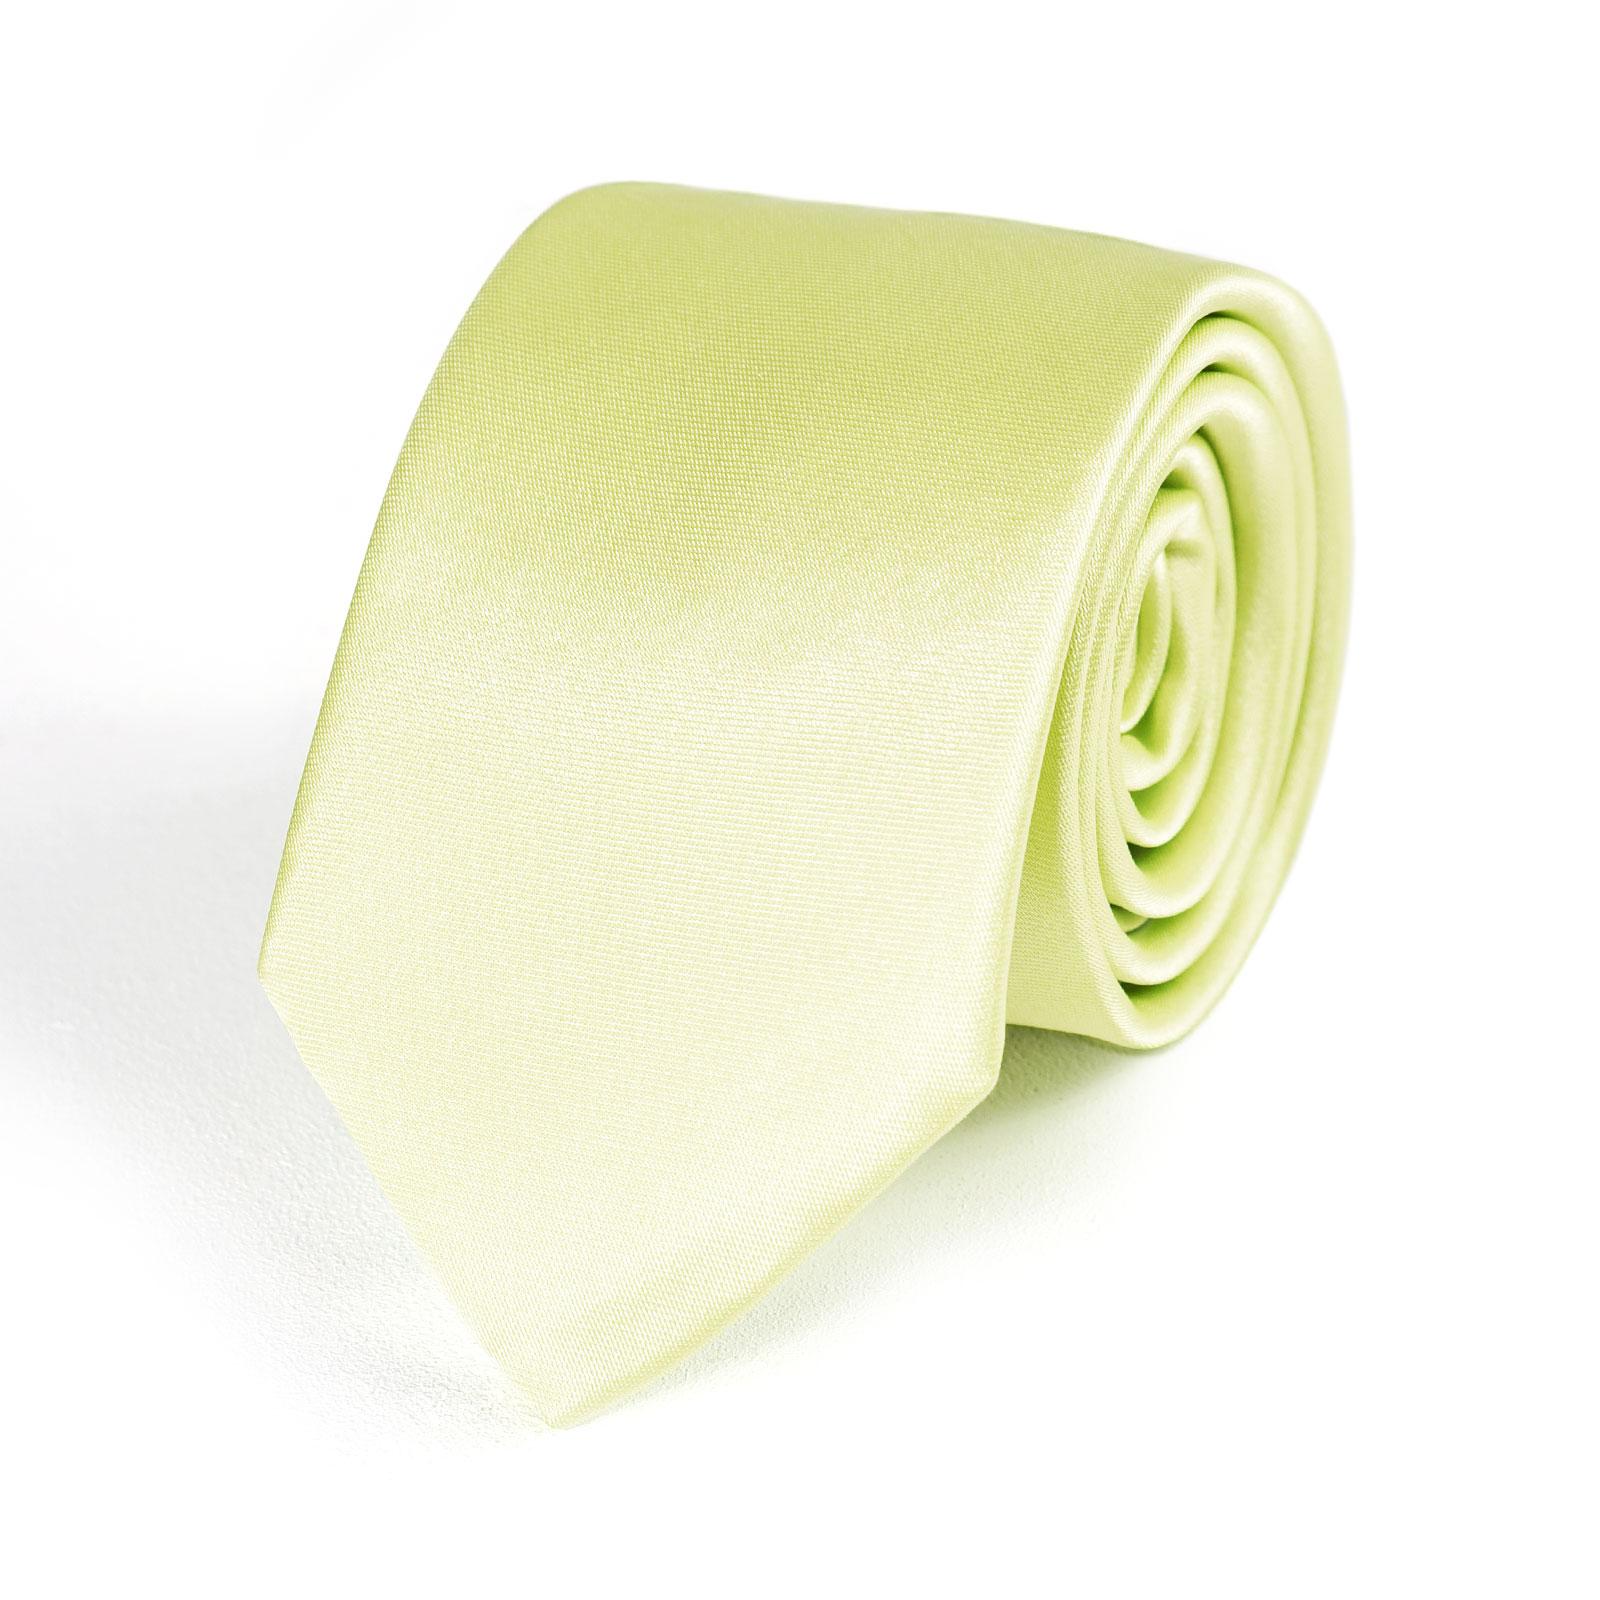 CV-00275-F16-cravate-slim-jaune-napoli-homme